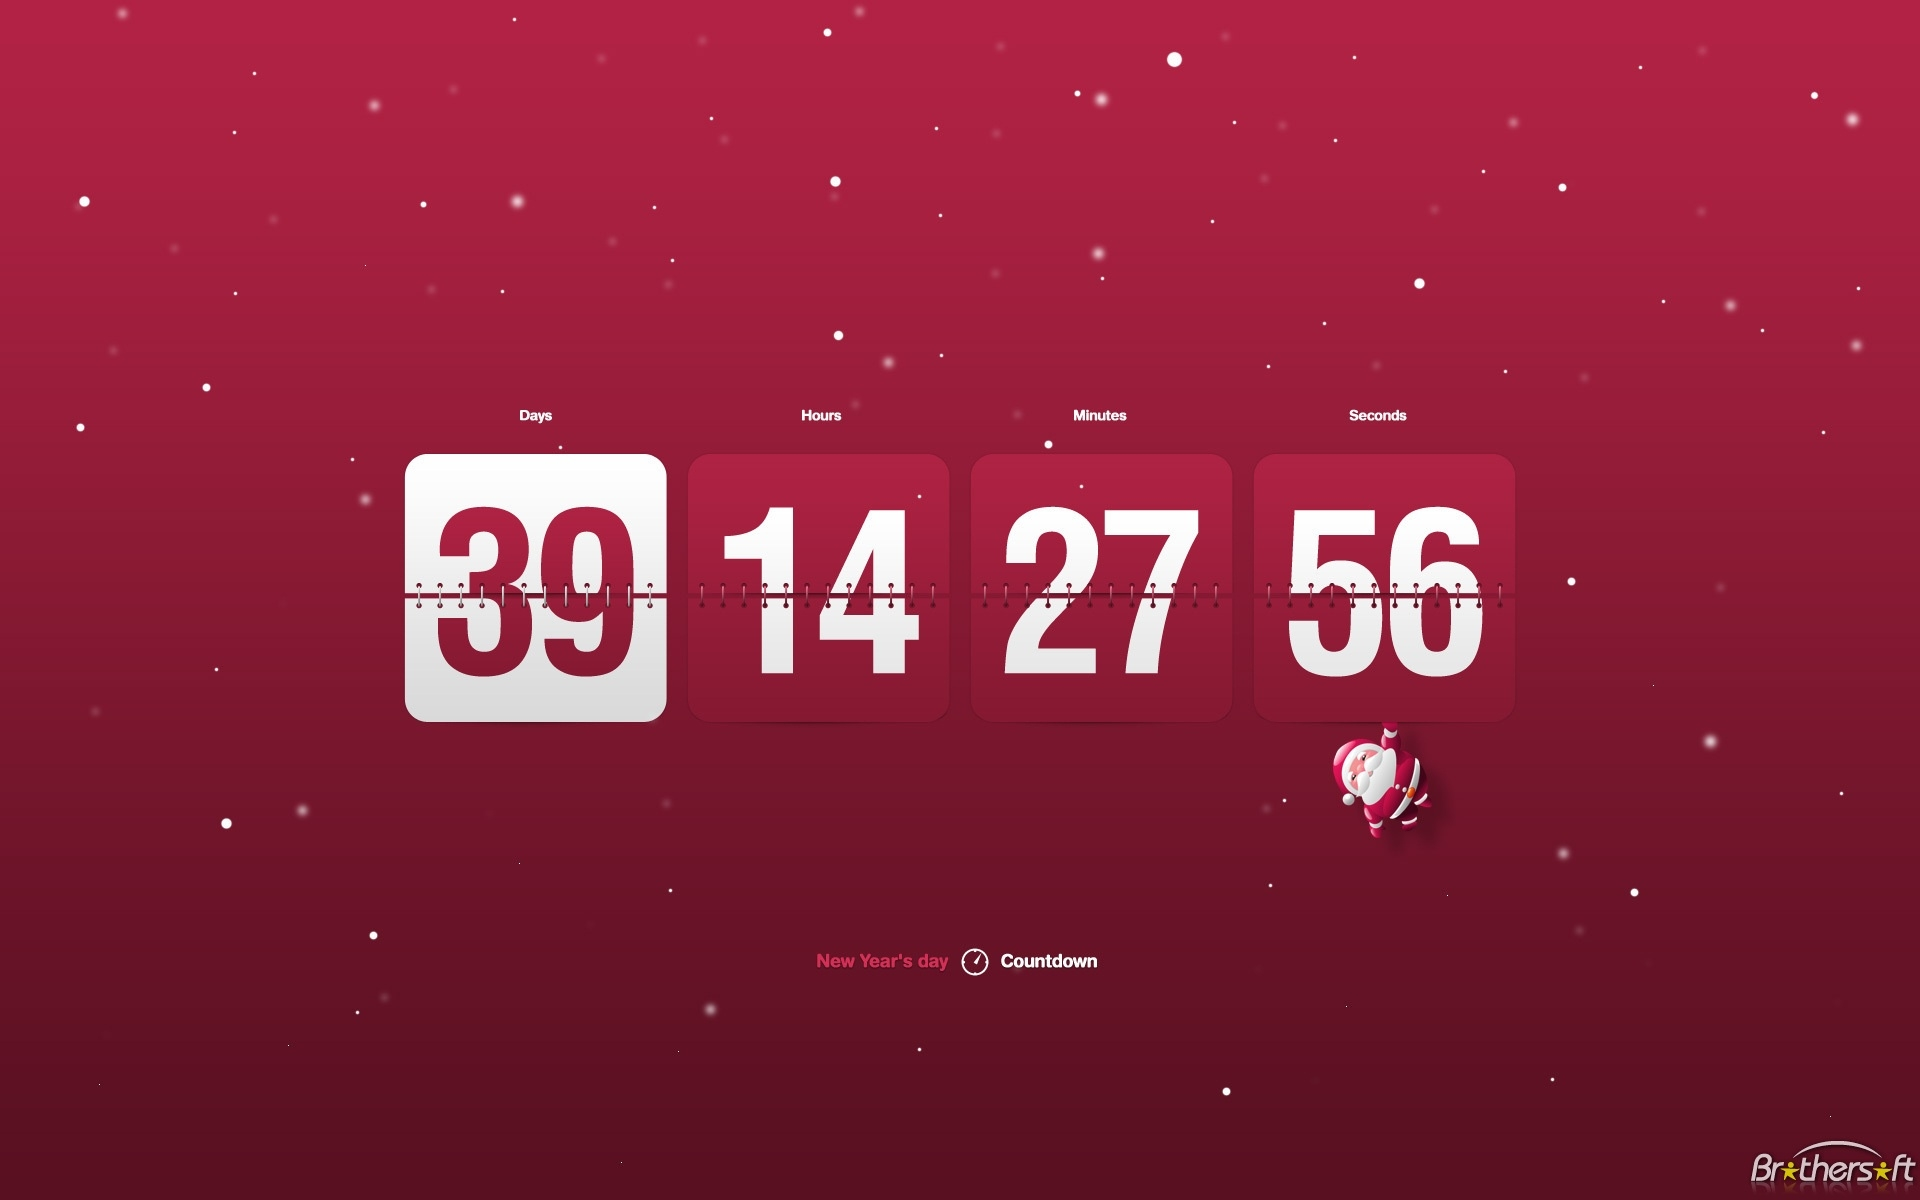 49+] Desktop Wallpaper Countdown Timer On Wallpapersafari_Countdown Calendar For Computer Desktop